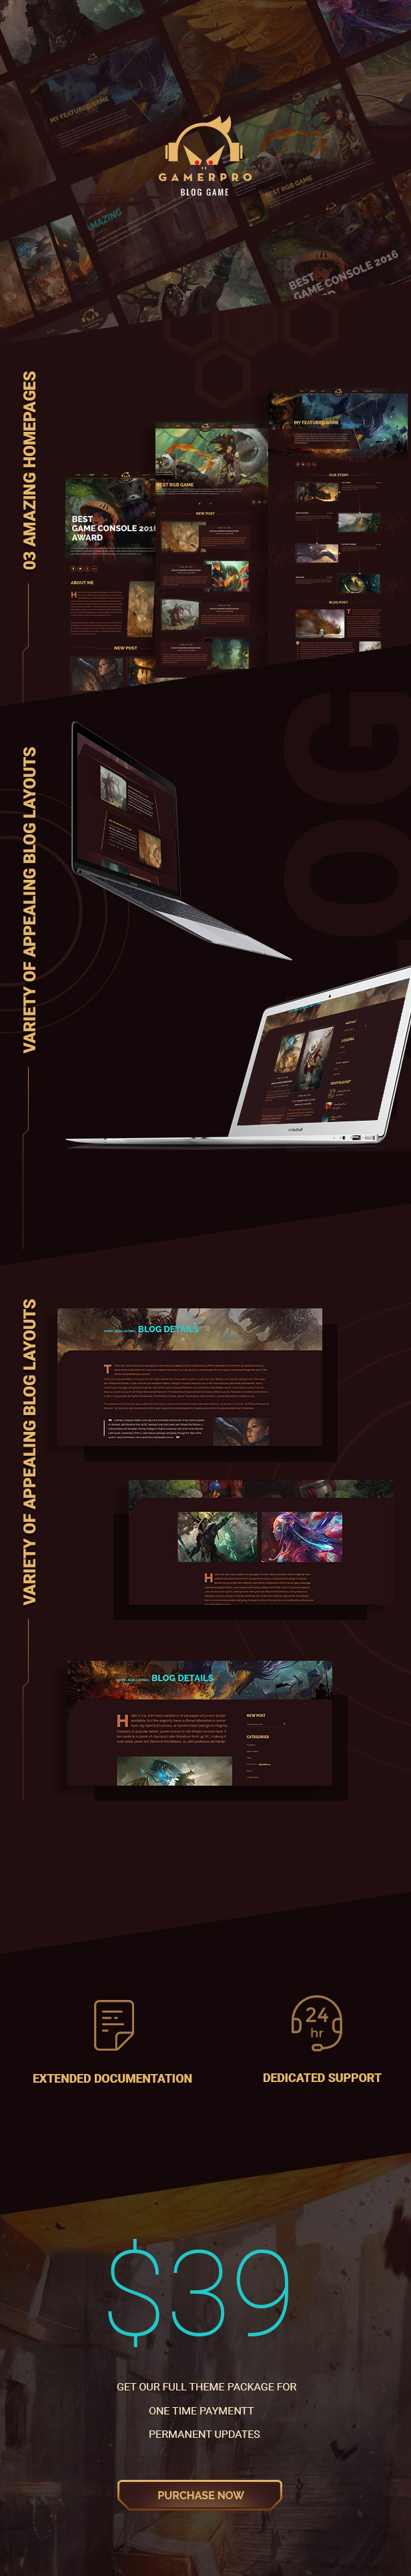 gamepro demo